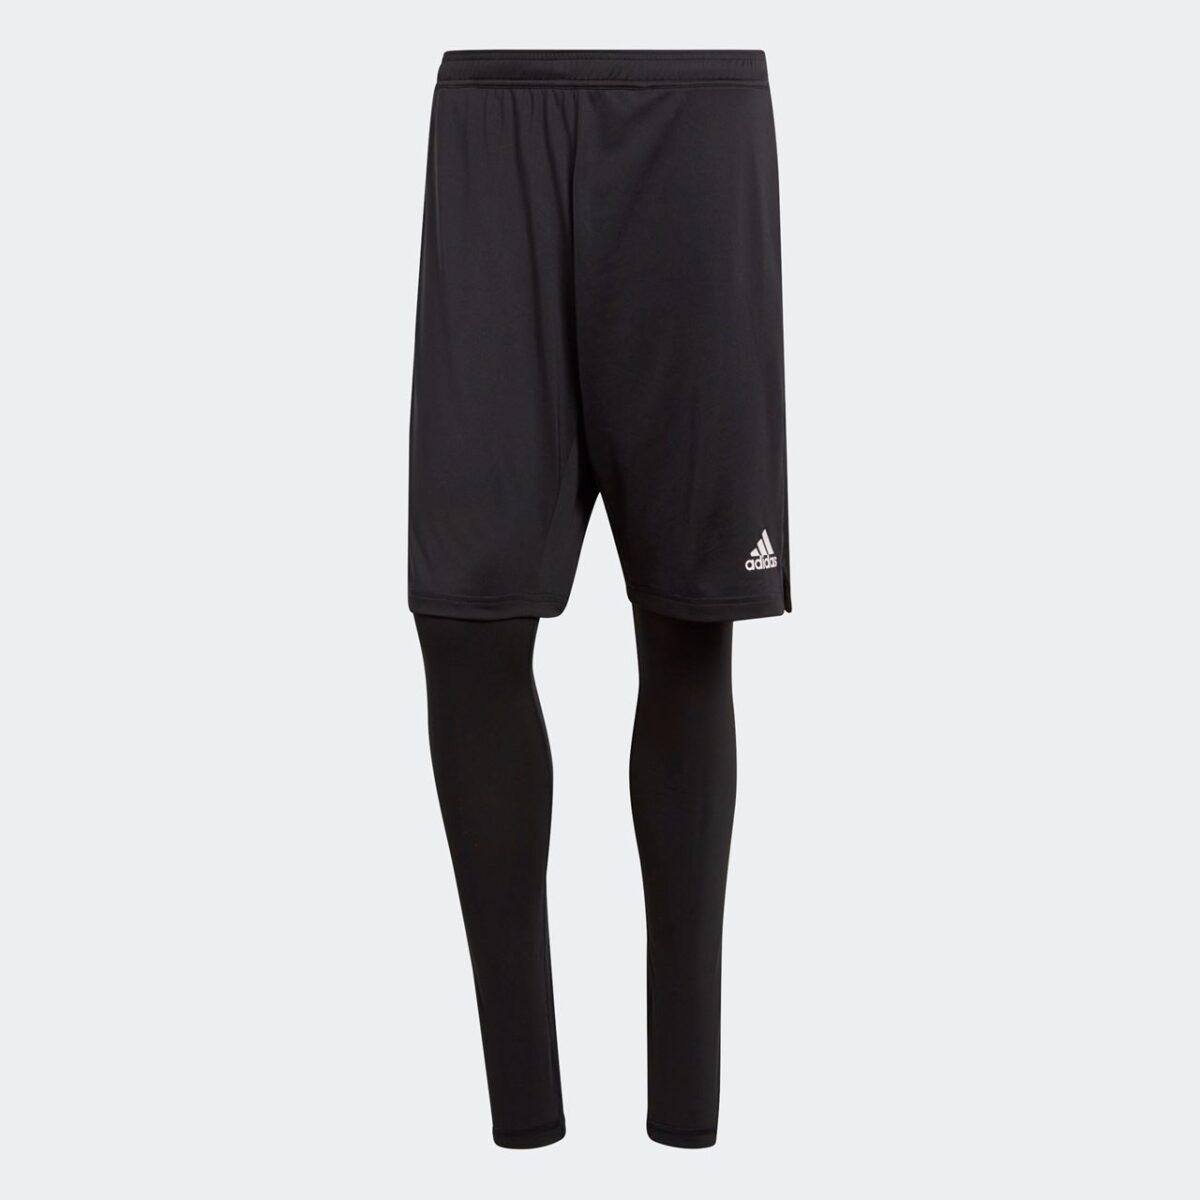 Adidas Condivo 18 2IN1 Shorts